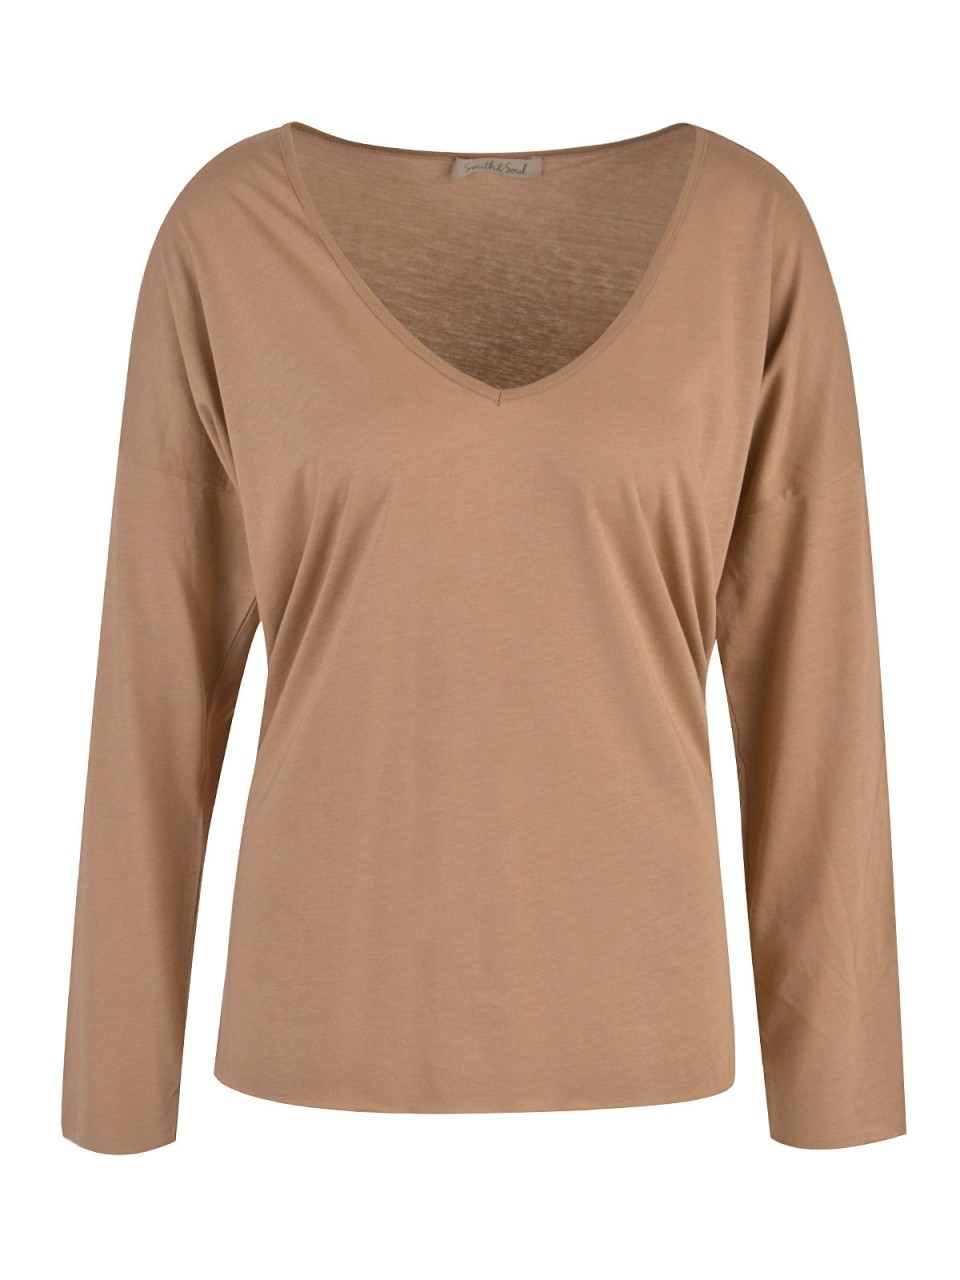 smith-amp-soul-damen-shirt-braun